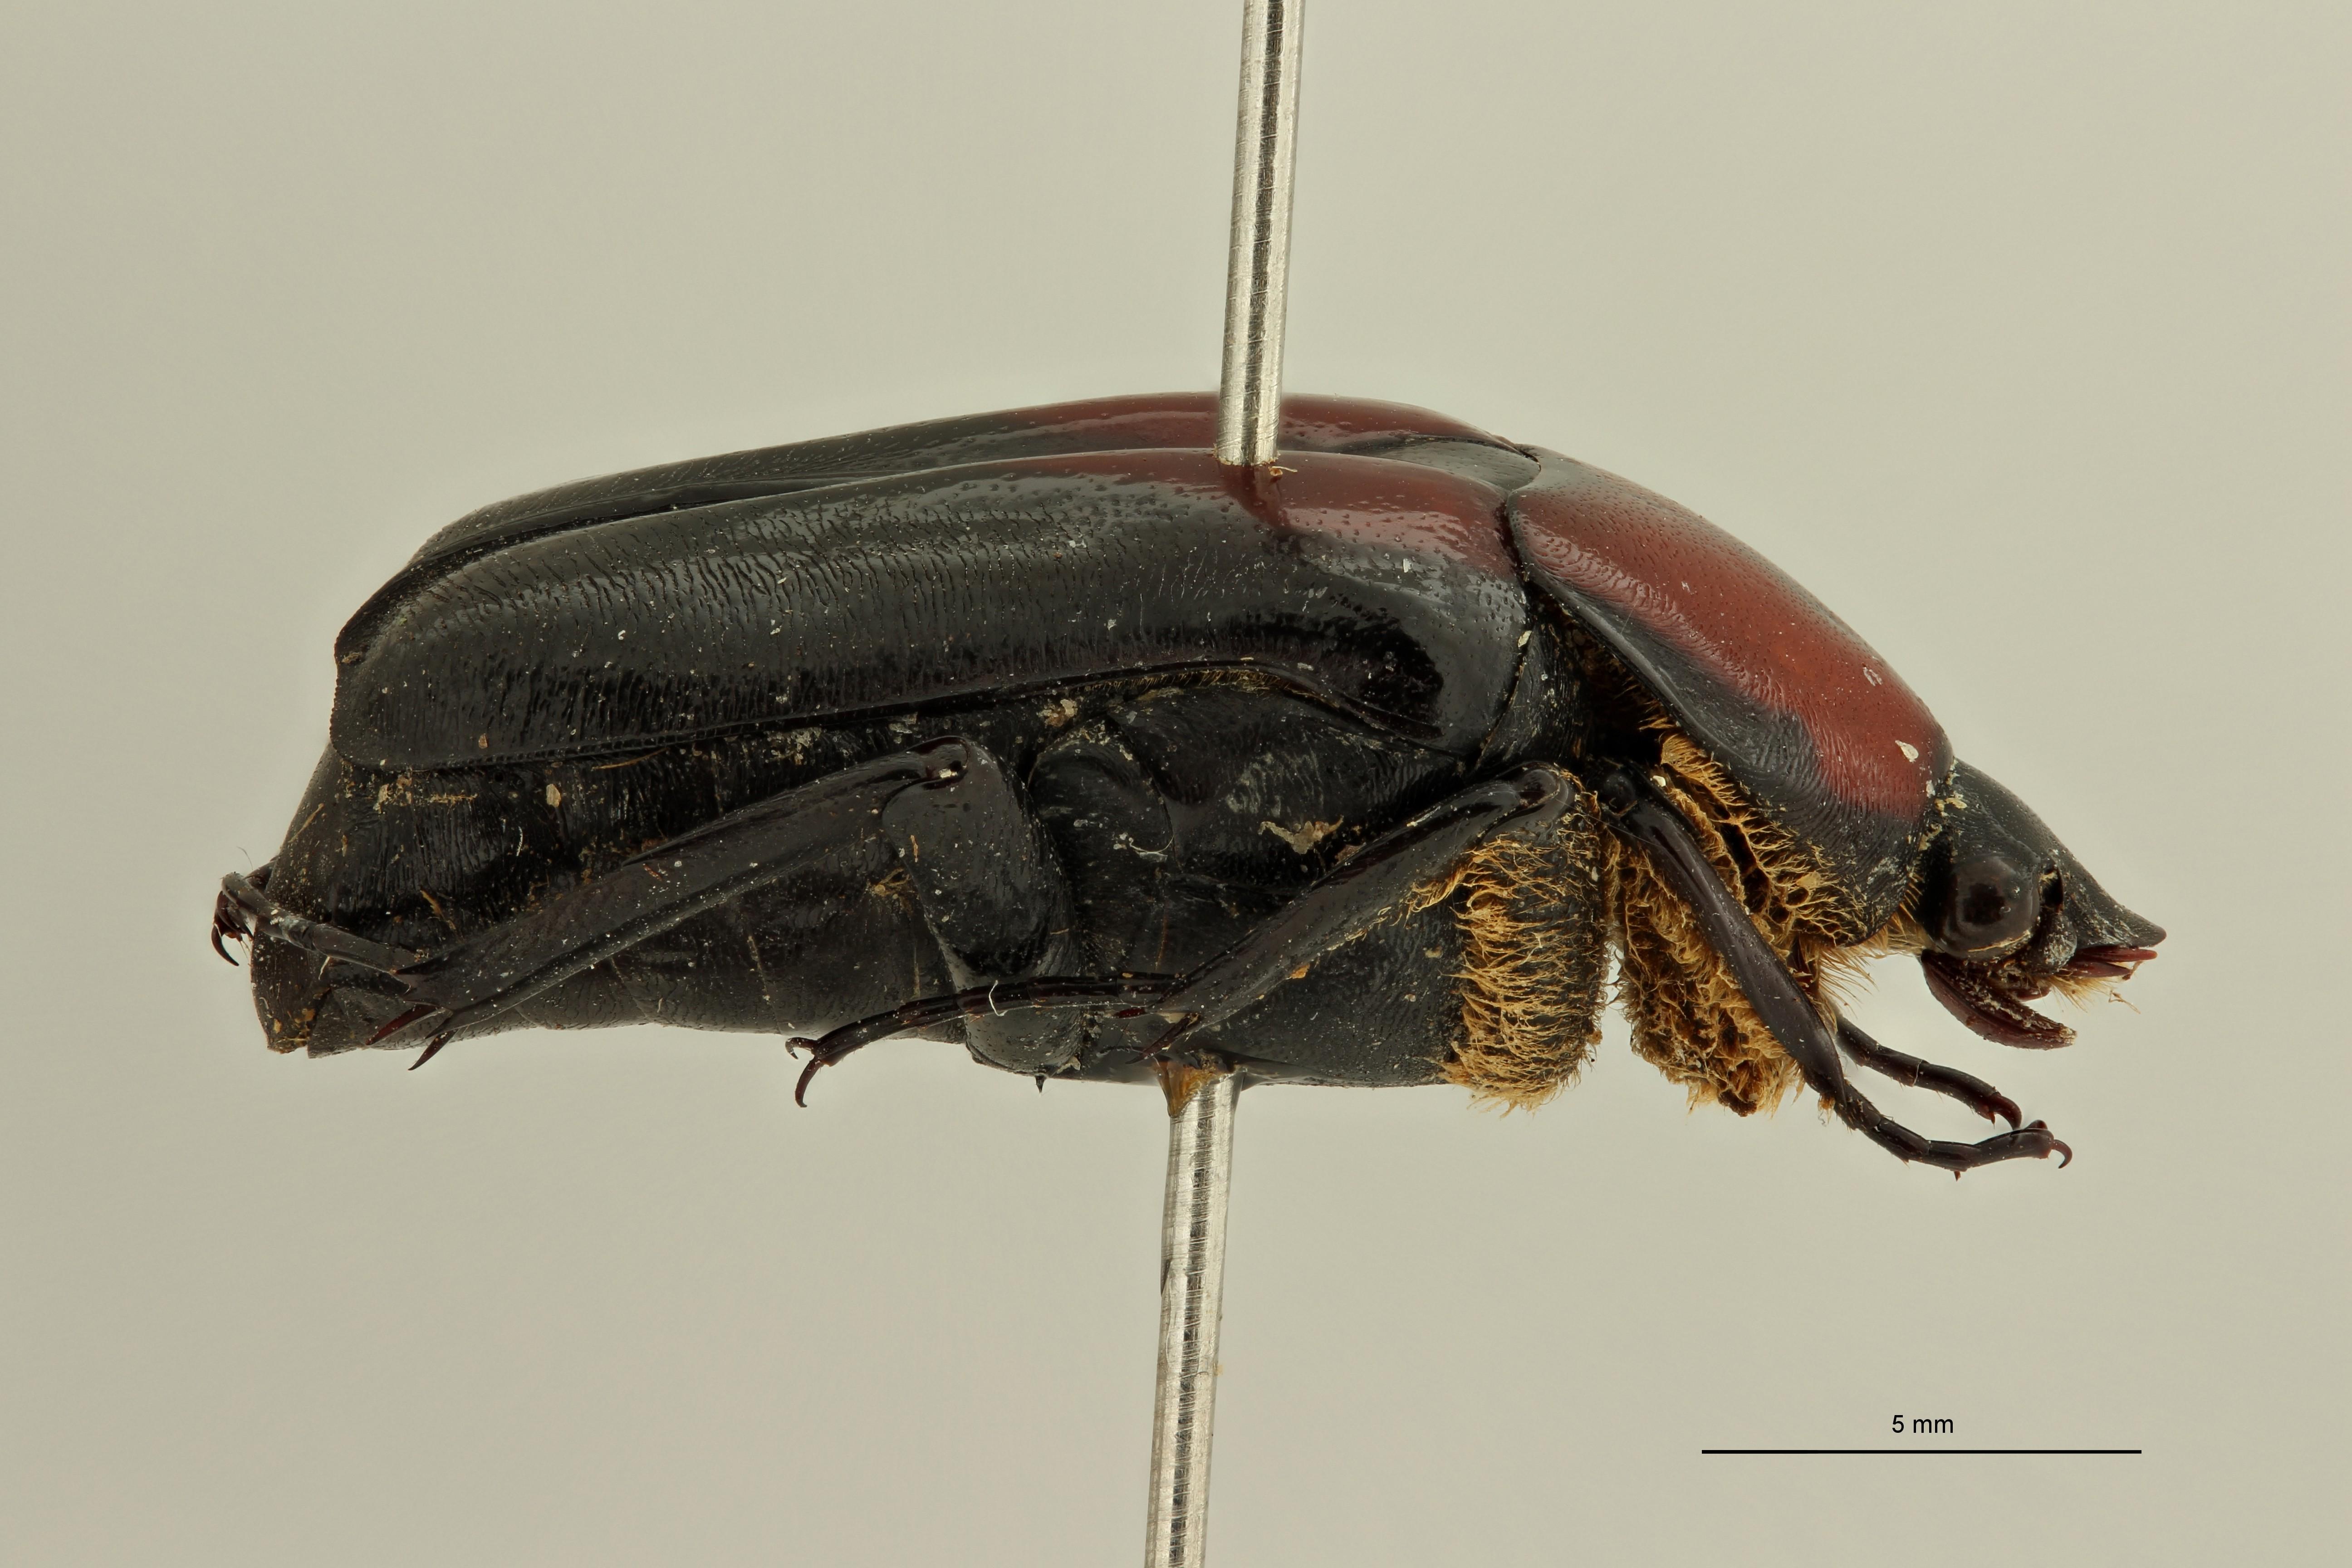 Goniochilus rotundiceps t L ZS PMax Scaled.jpeg